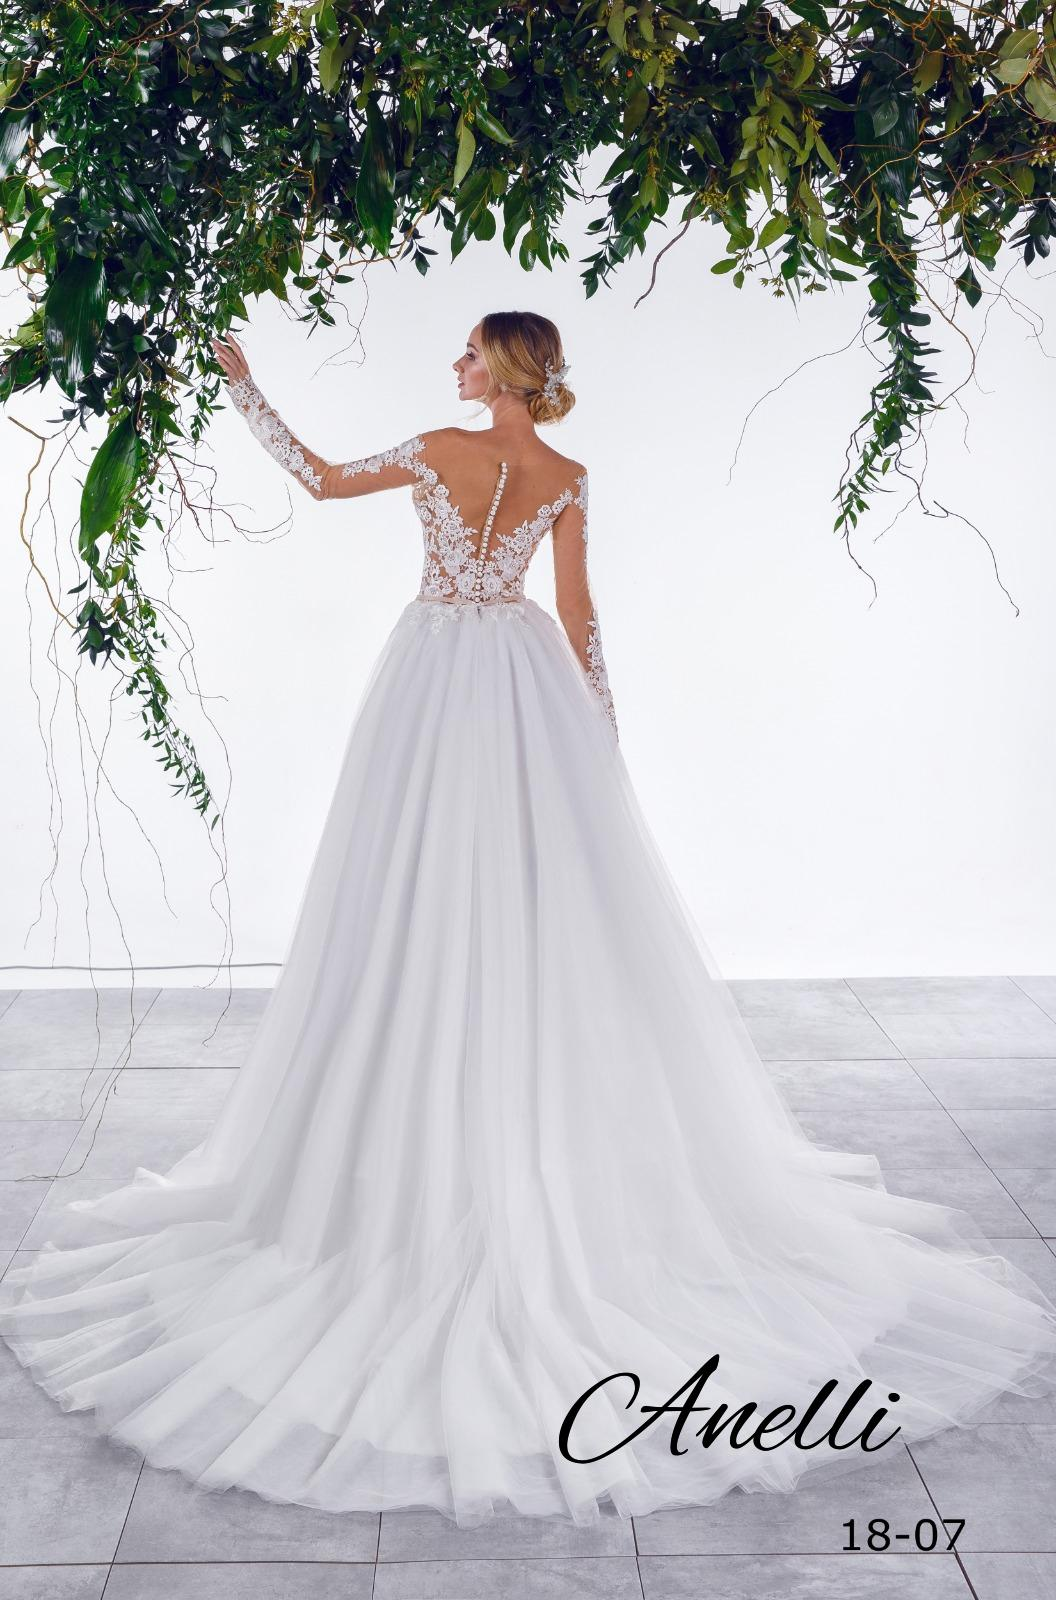 Svadobné šaty - Floral 1807 - Obrázok č. 2